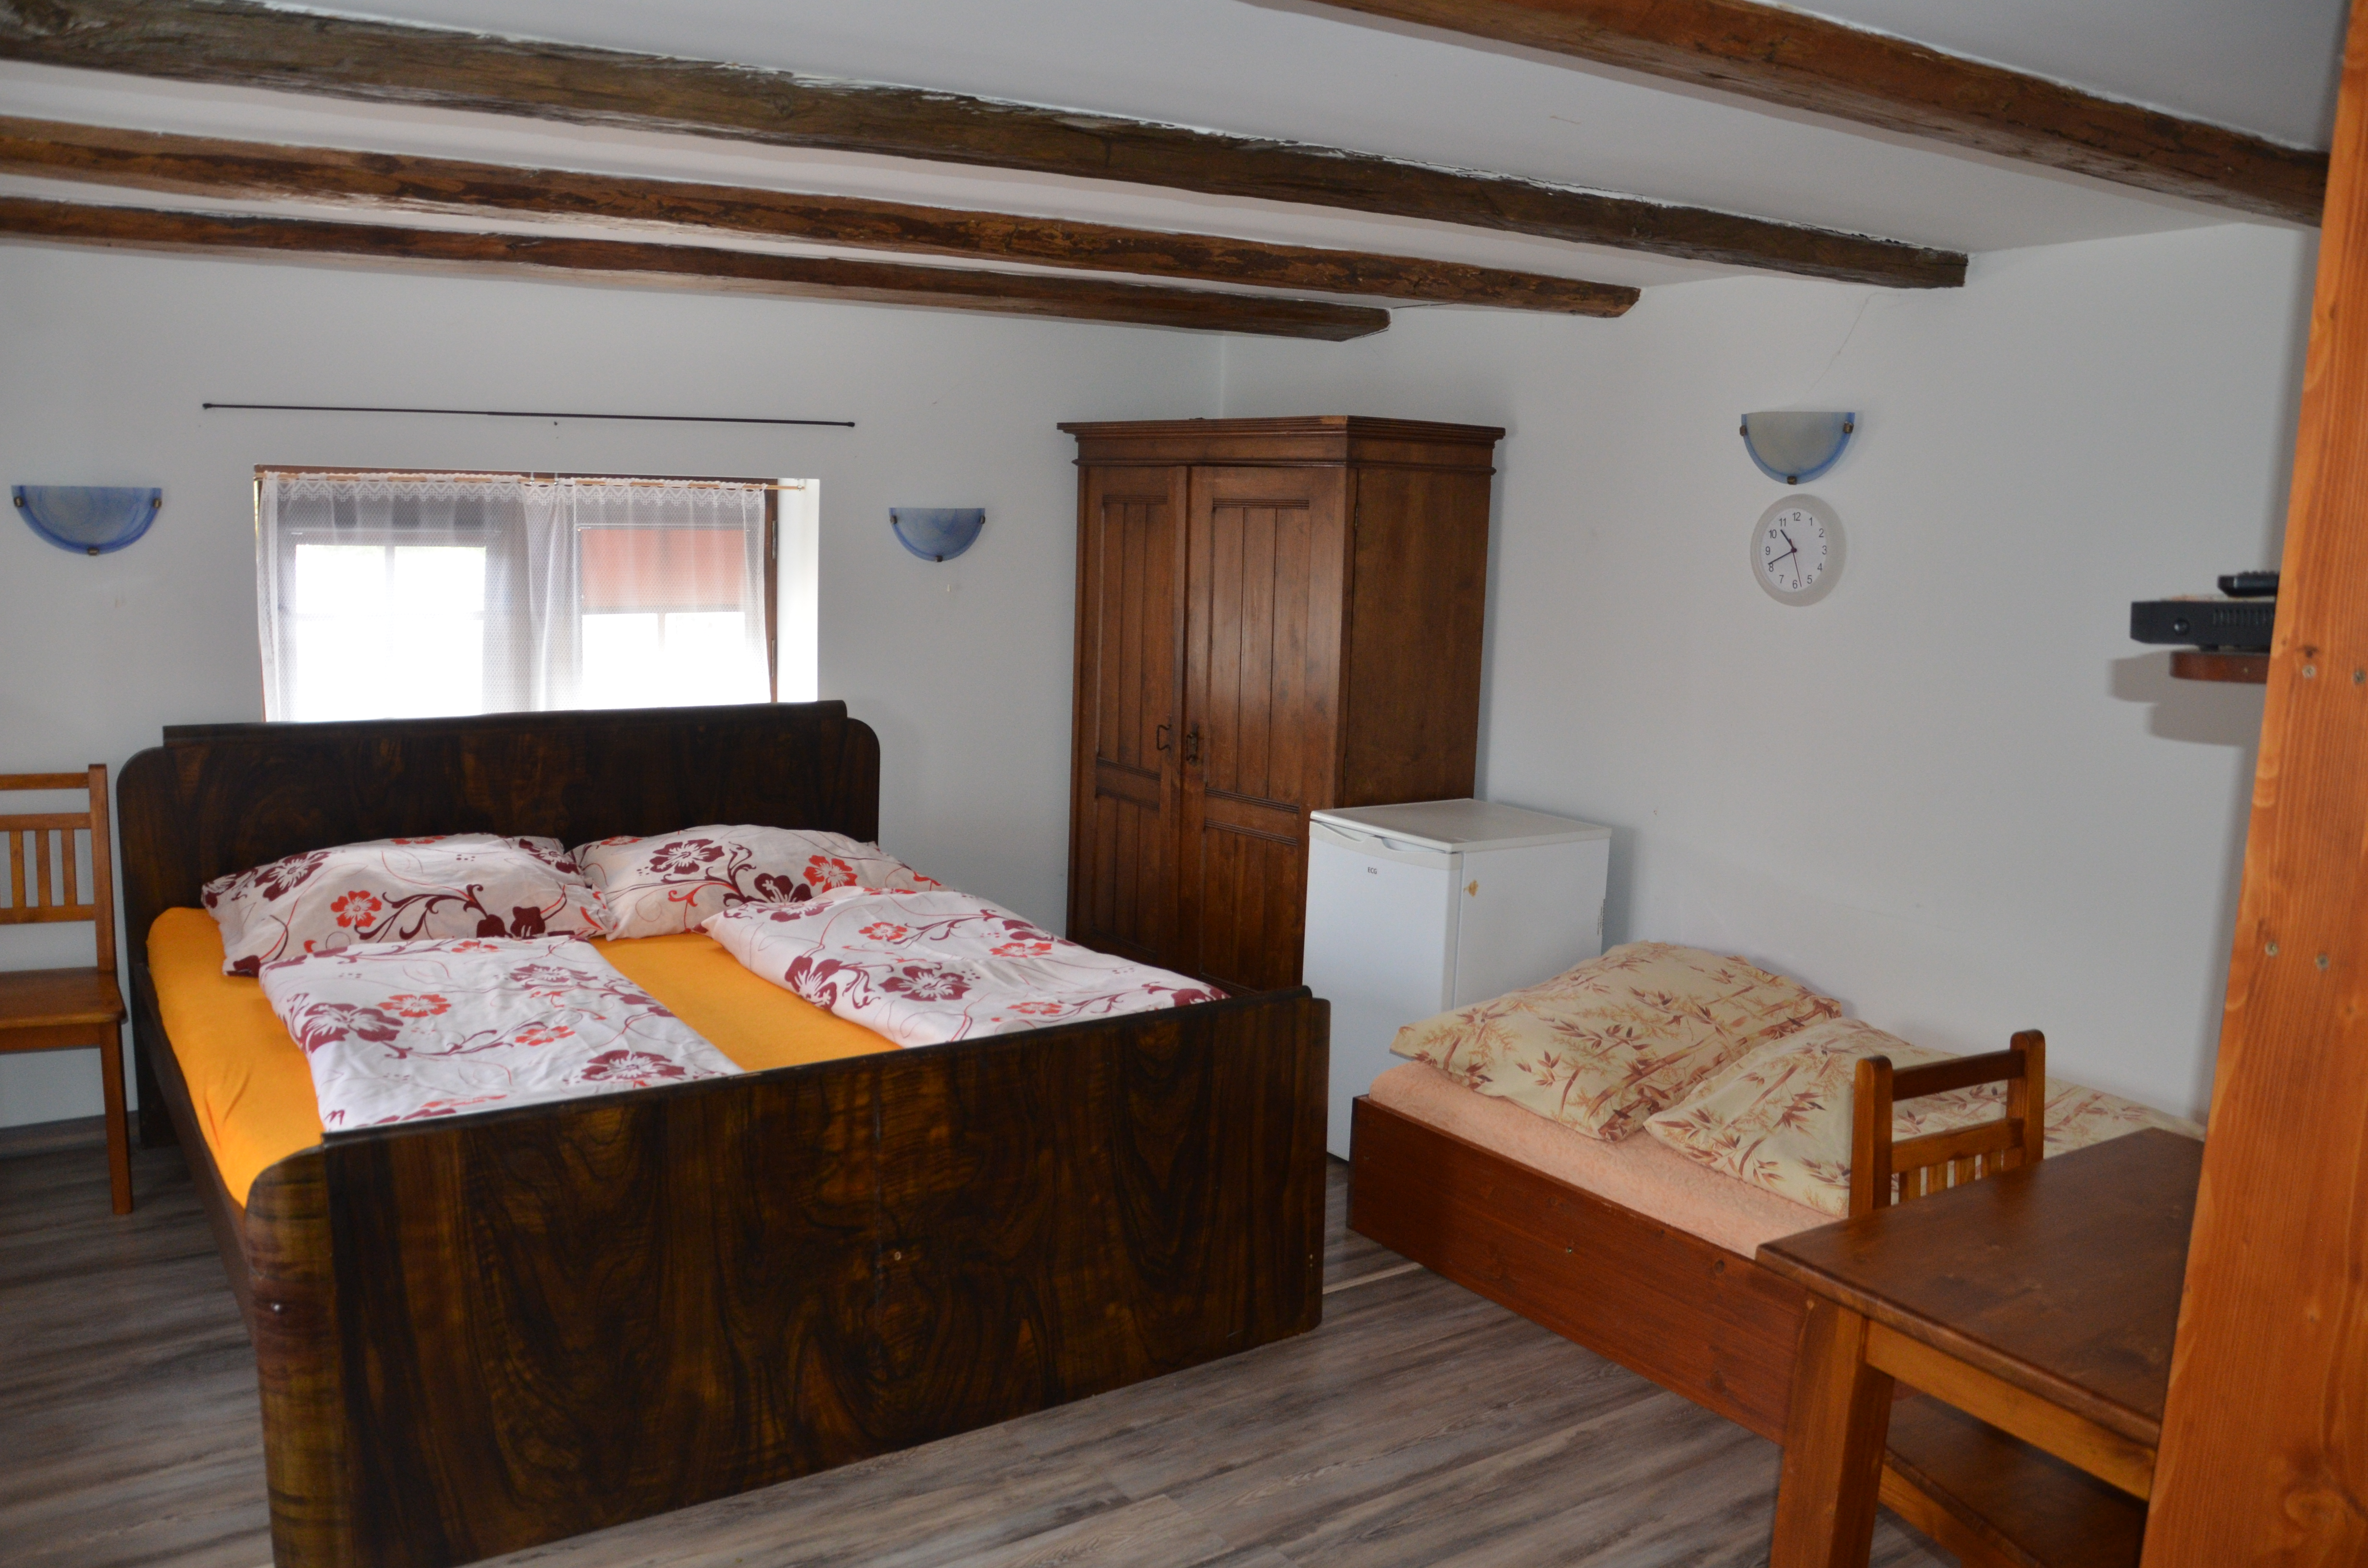 Bezbariérový pokoj postel + přistýlka